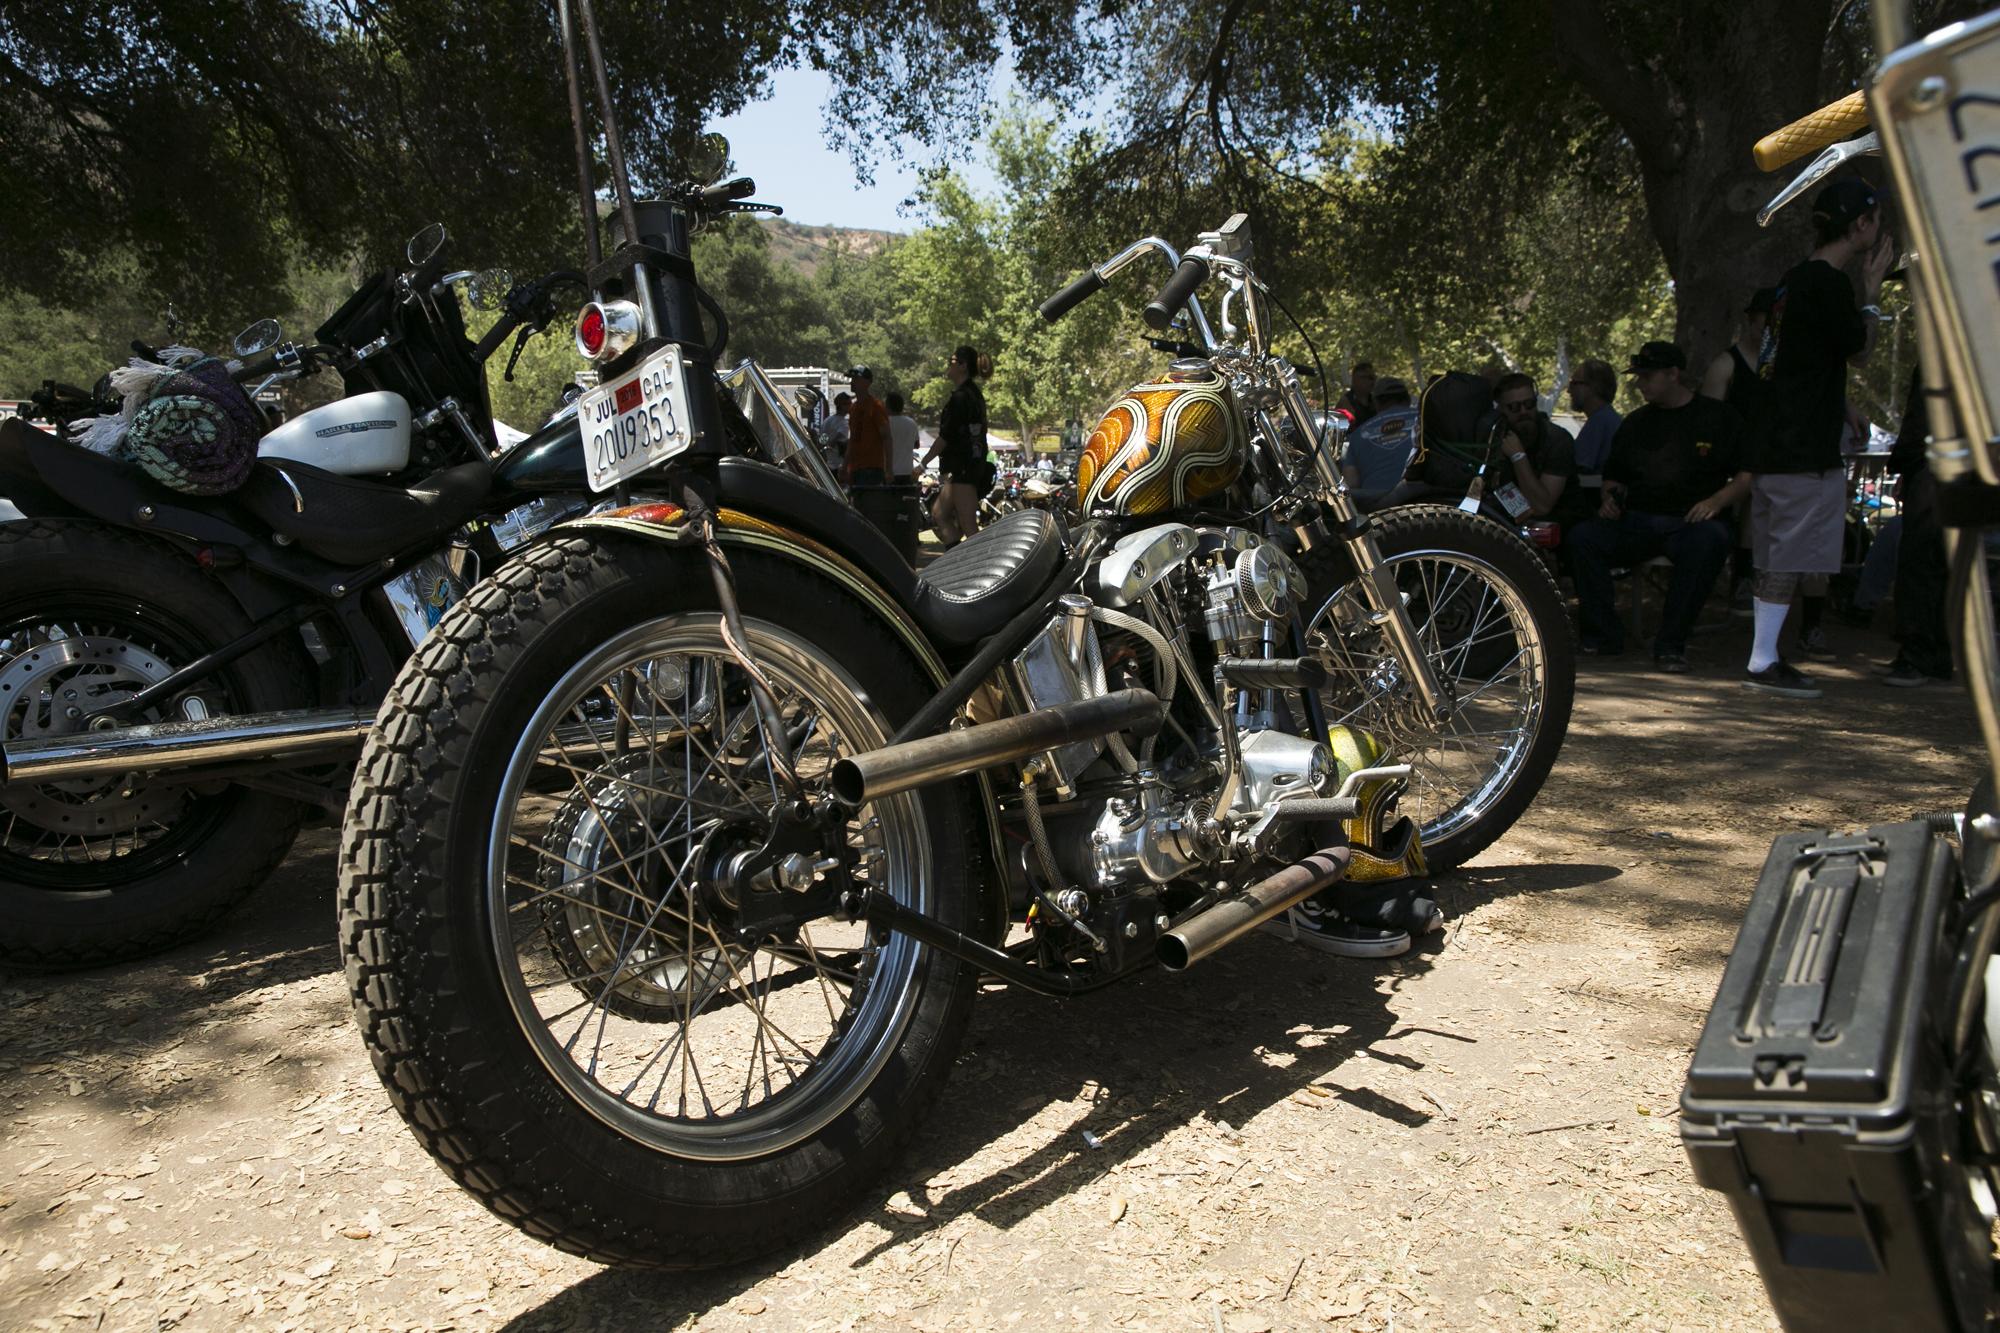 Born Free 8 Motorcycle Show-117.jpg